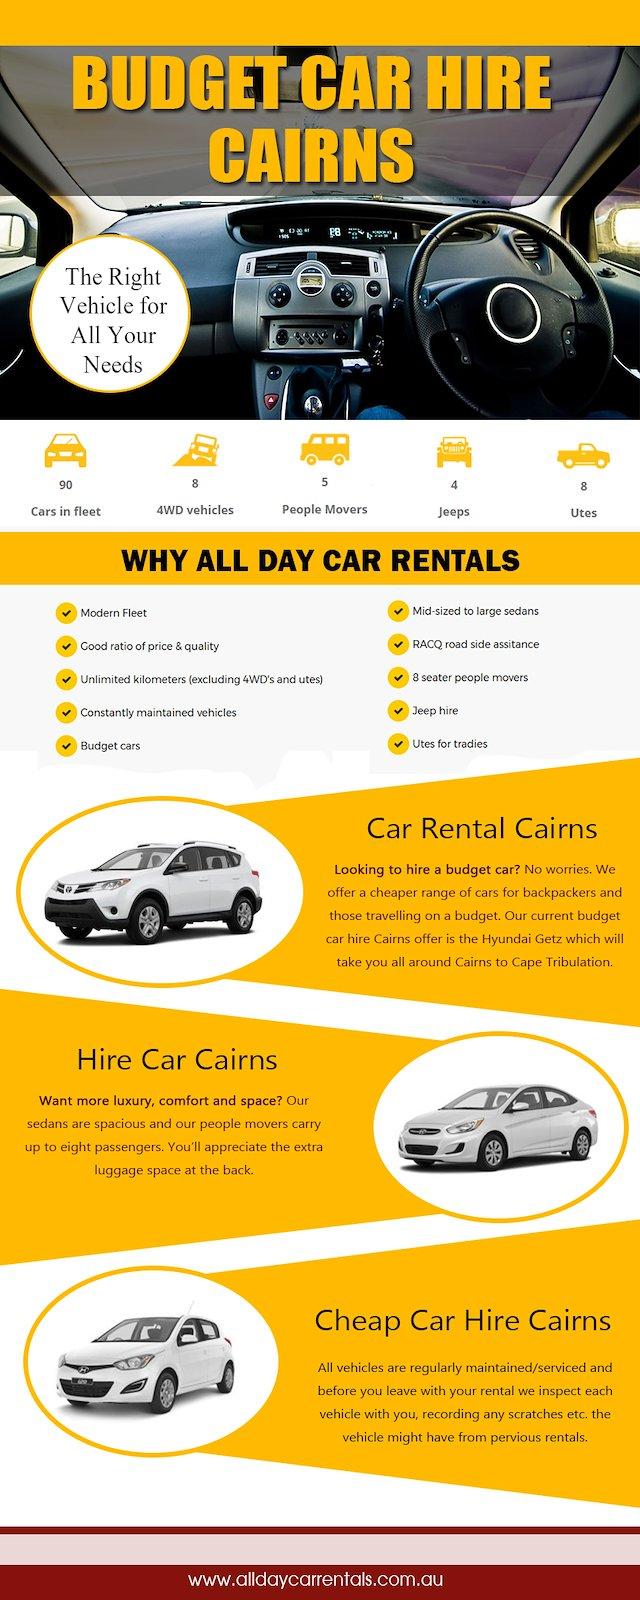 Car Rental Cairns Cairns Car Rental